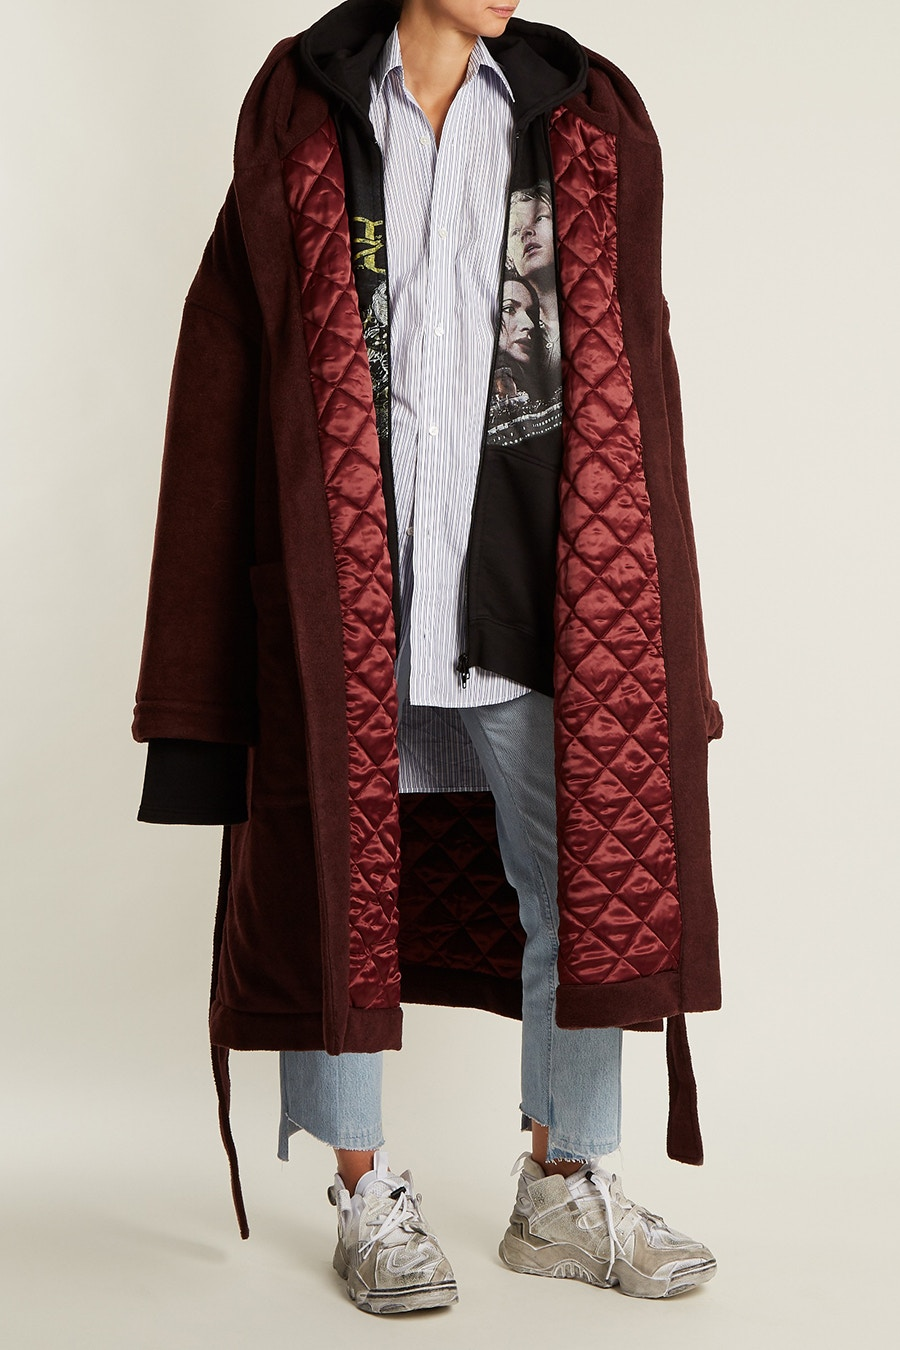 vetements robe coat 2